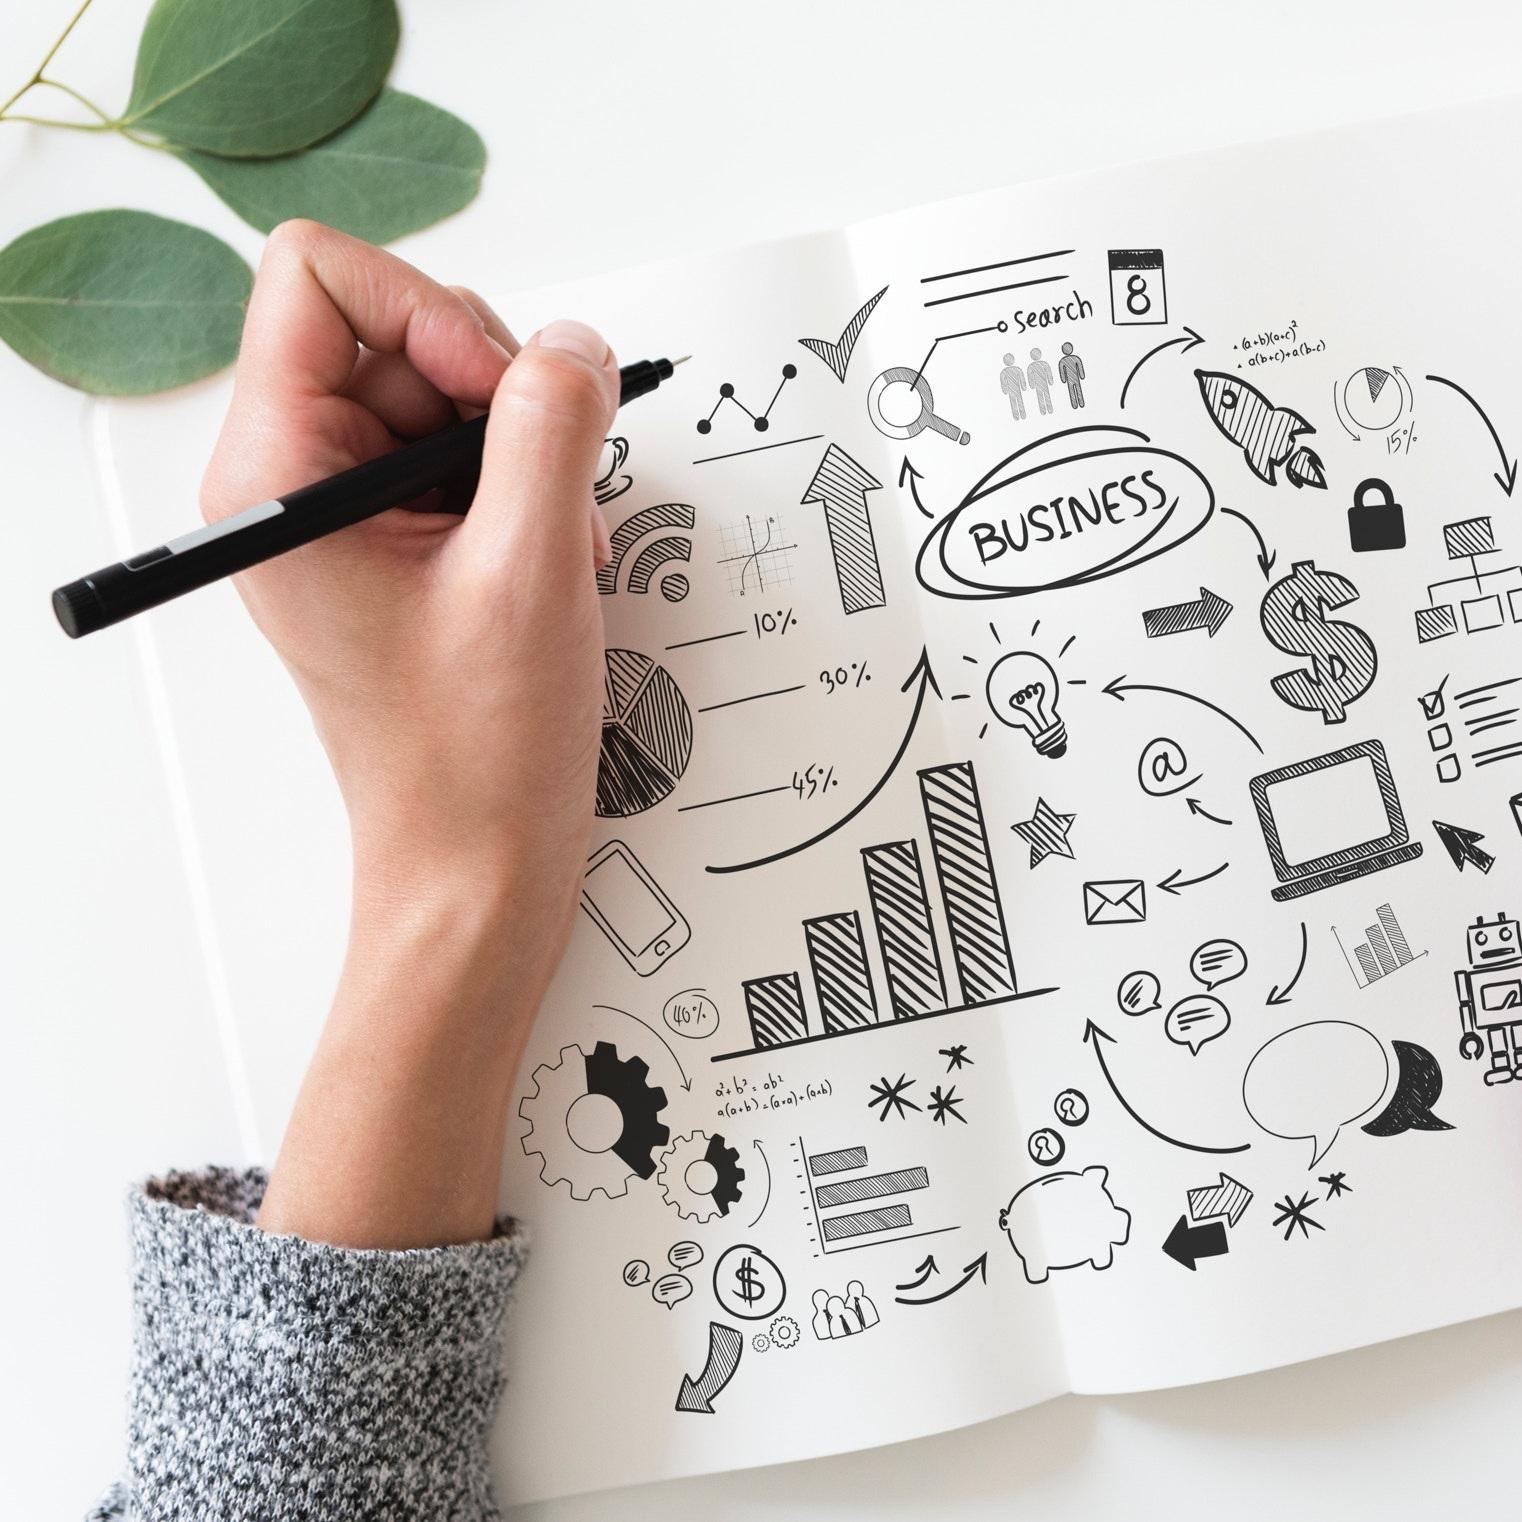 Strategy, sitemaps & information architecture -